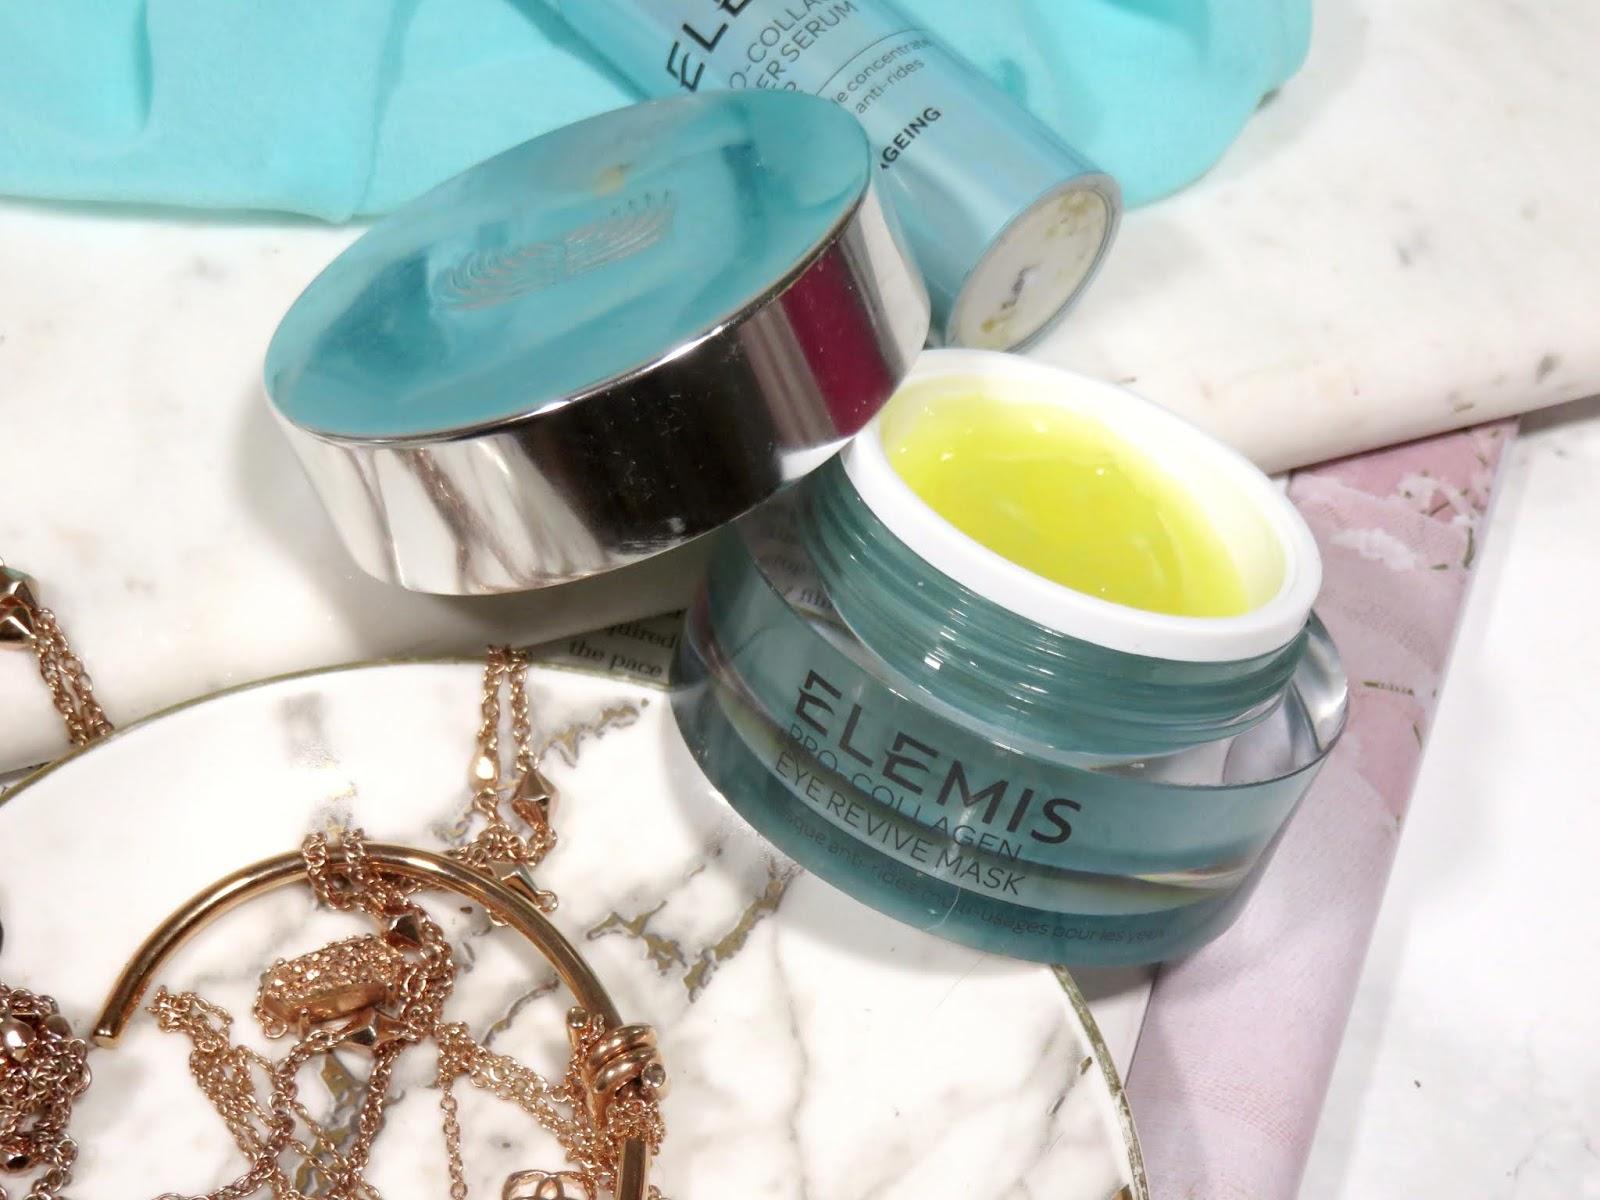 Elemis Pro-Collagen Eye Revive Mask Review